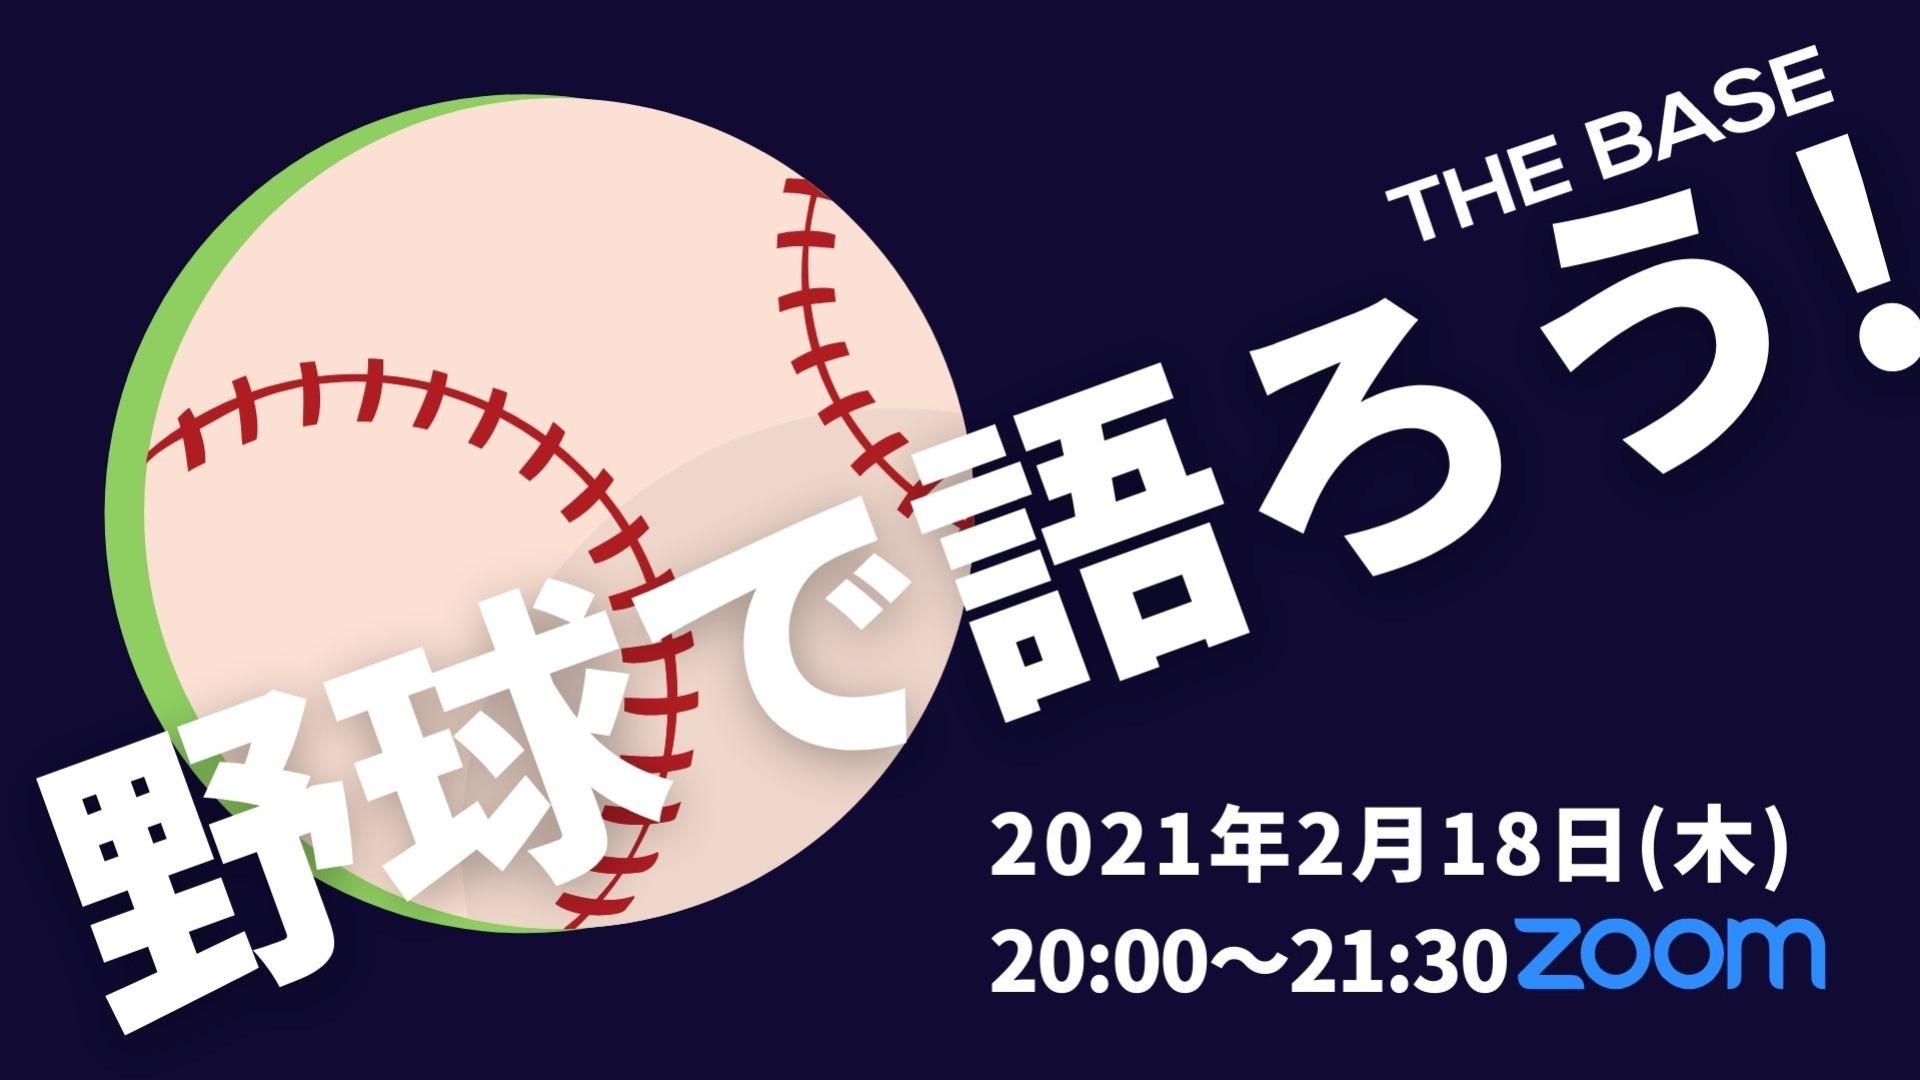 THE BASE会員ディスカッション企画!『野球で語ろう!』